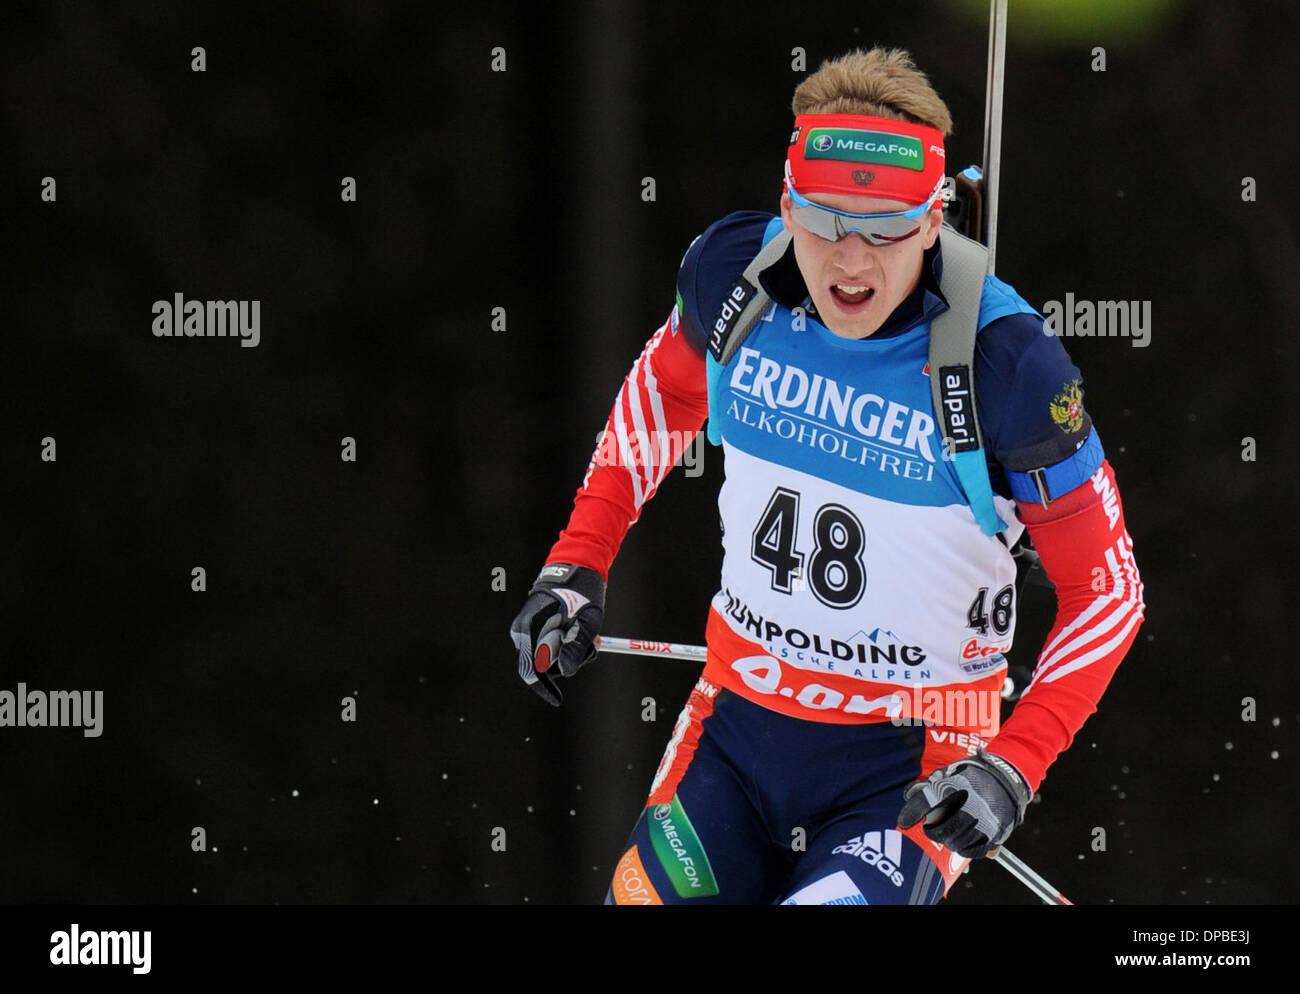 Alexey Volkov - Russian biathlete 18